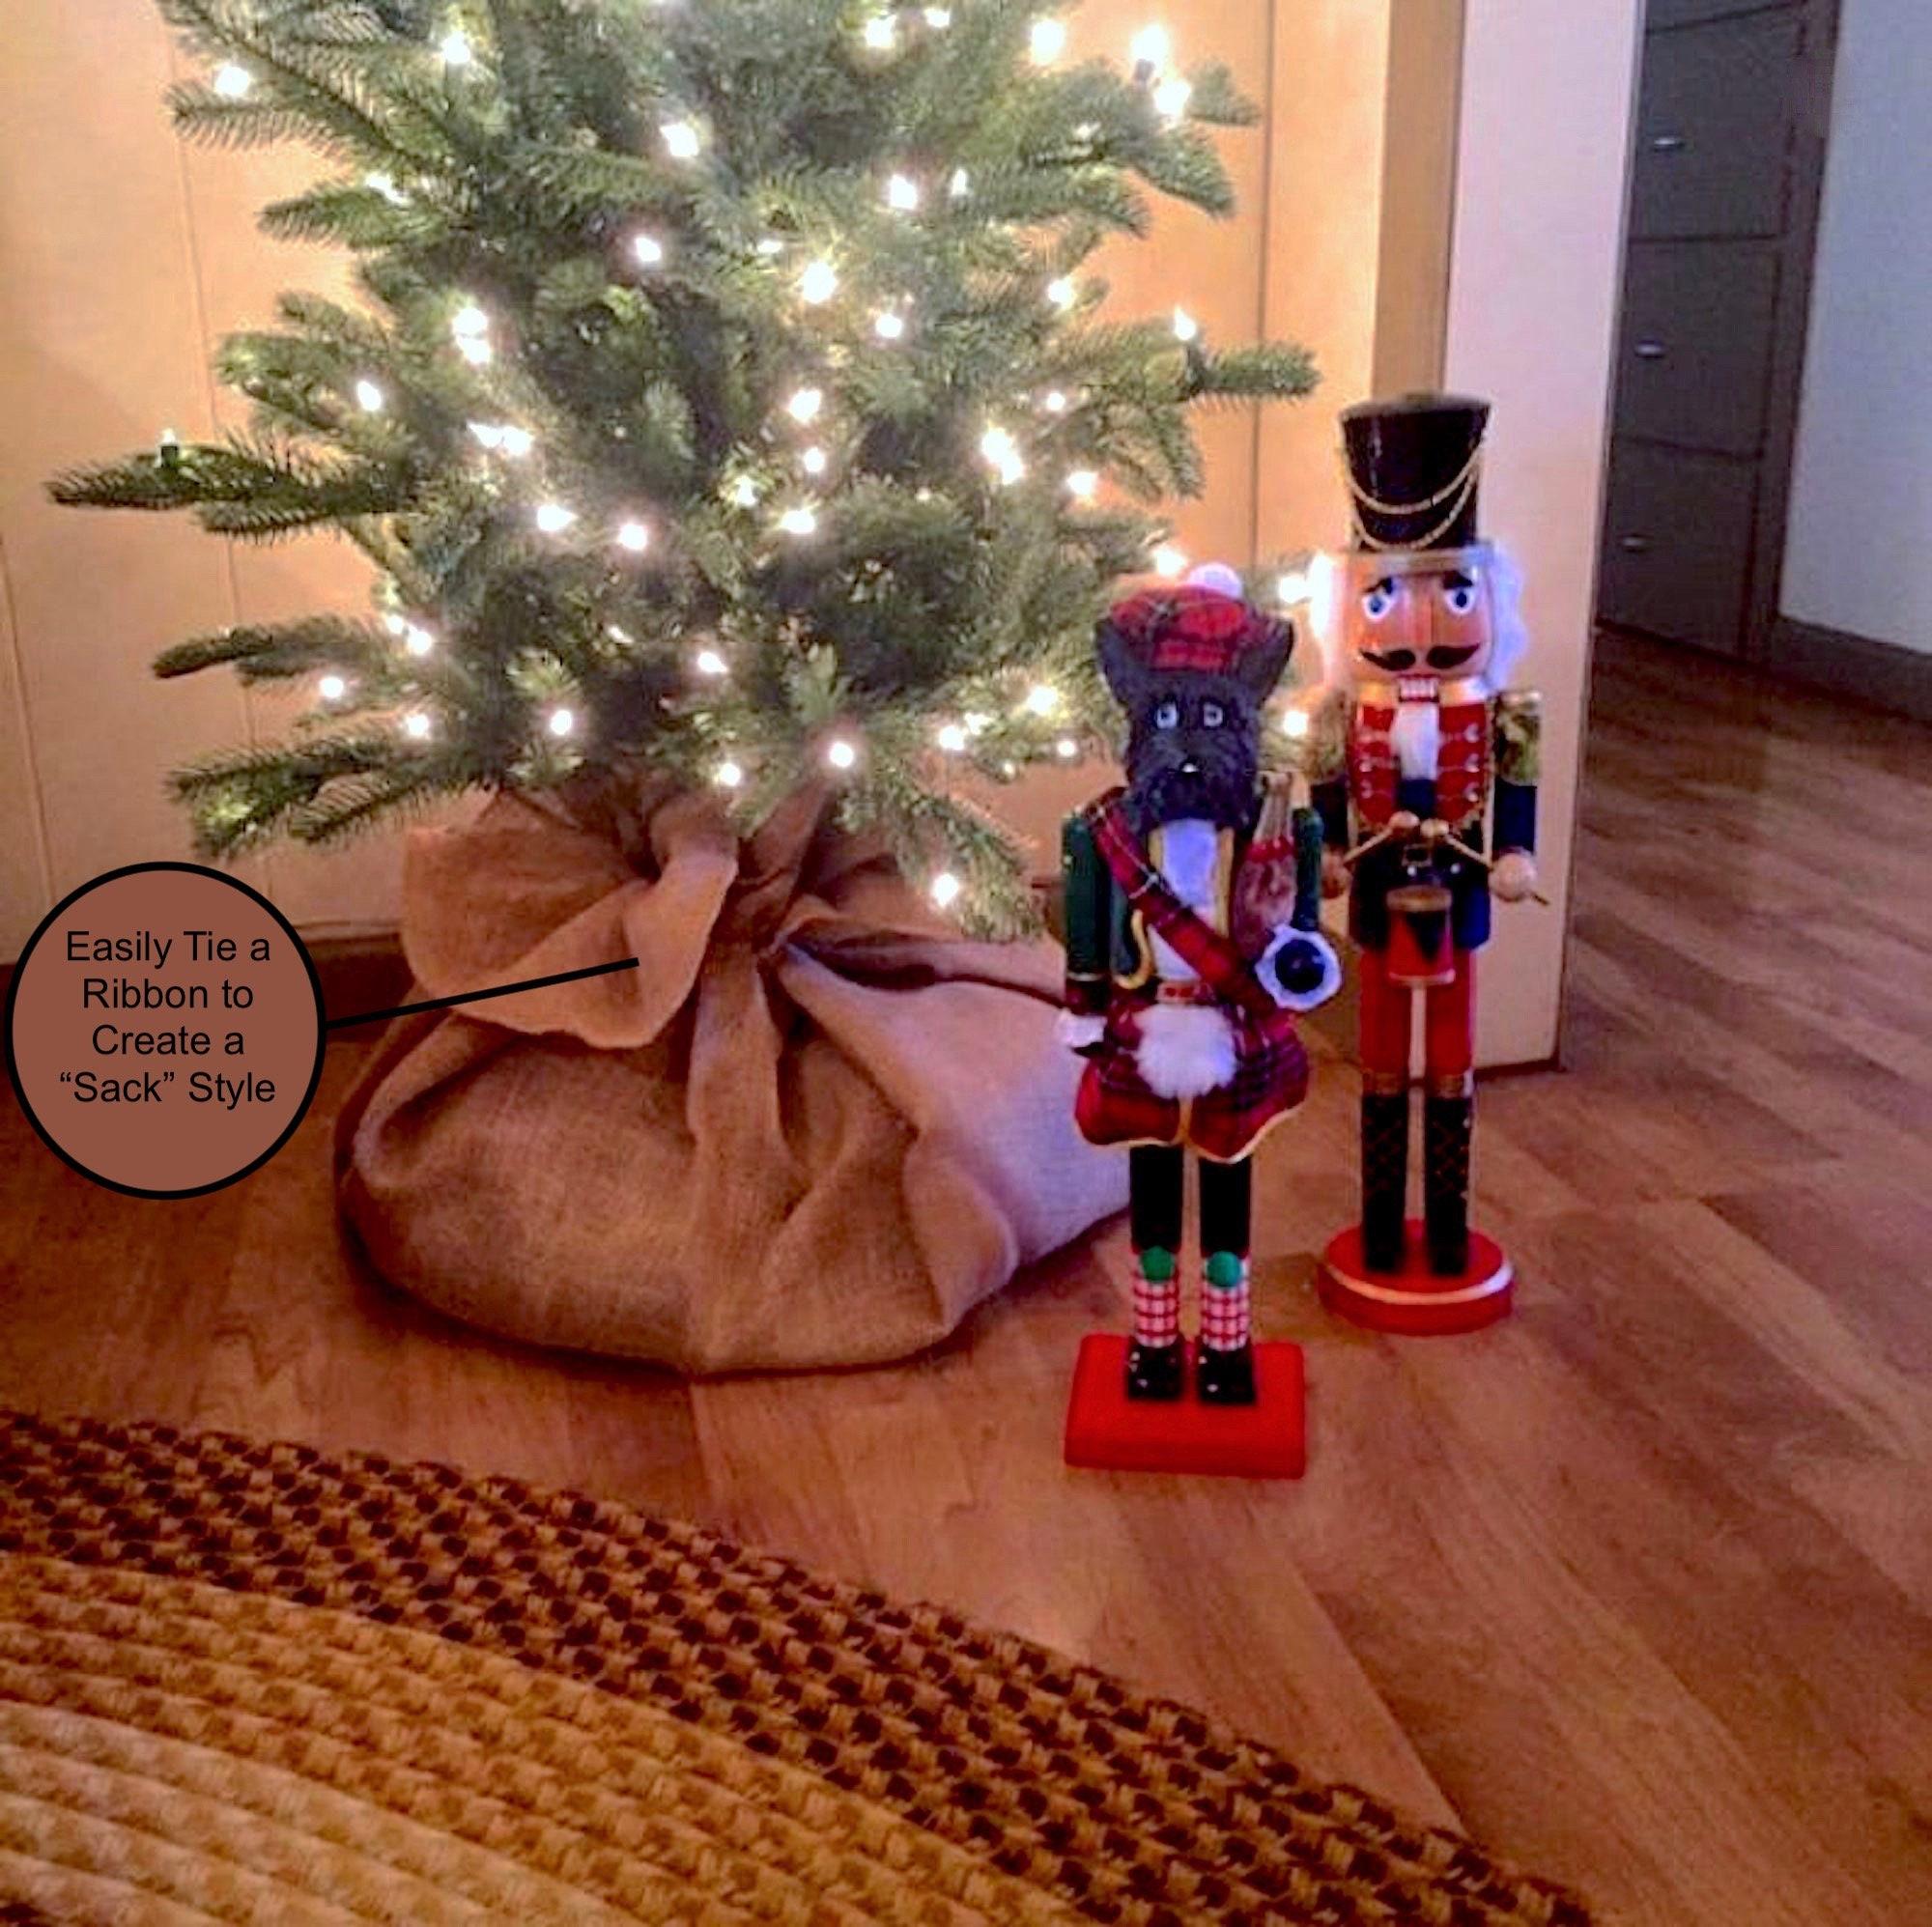 Burlap Christmas Tree Skirt Tree Sack Christmas Tree Skirt Tree Skirt Christmas Decor Tree Skirt Jute Burlap Rustic Decor Diff Sizes